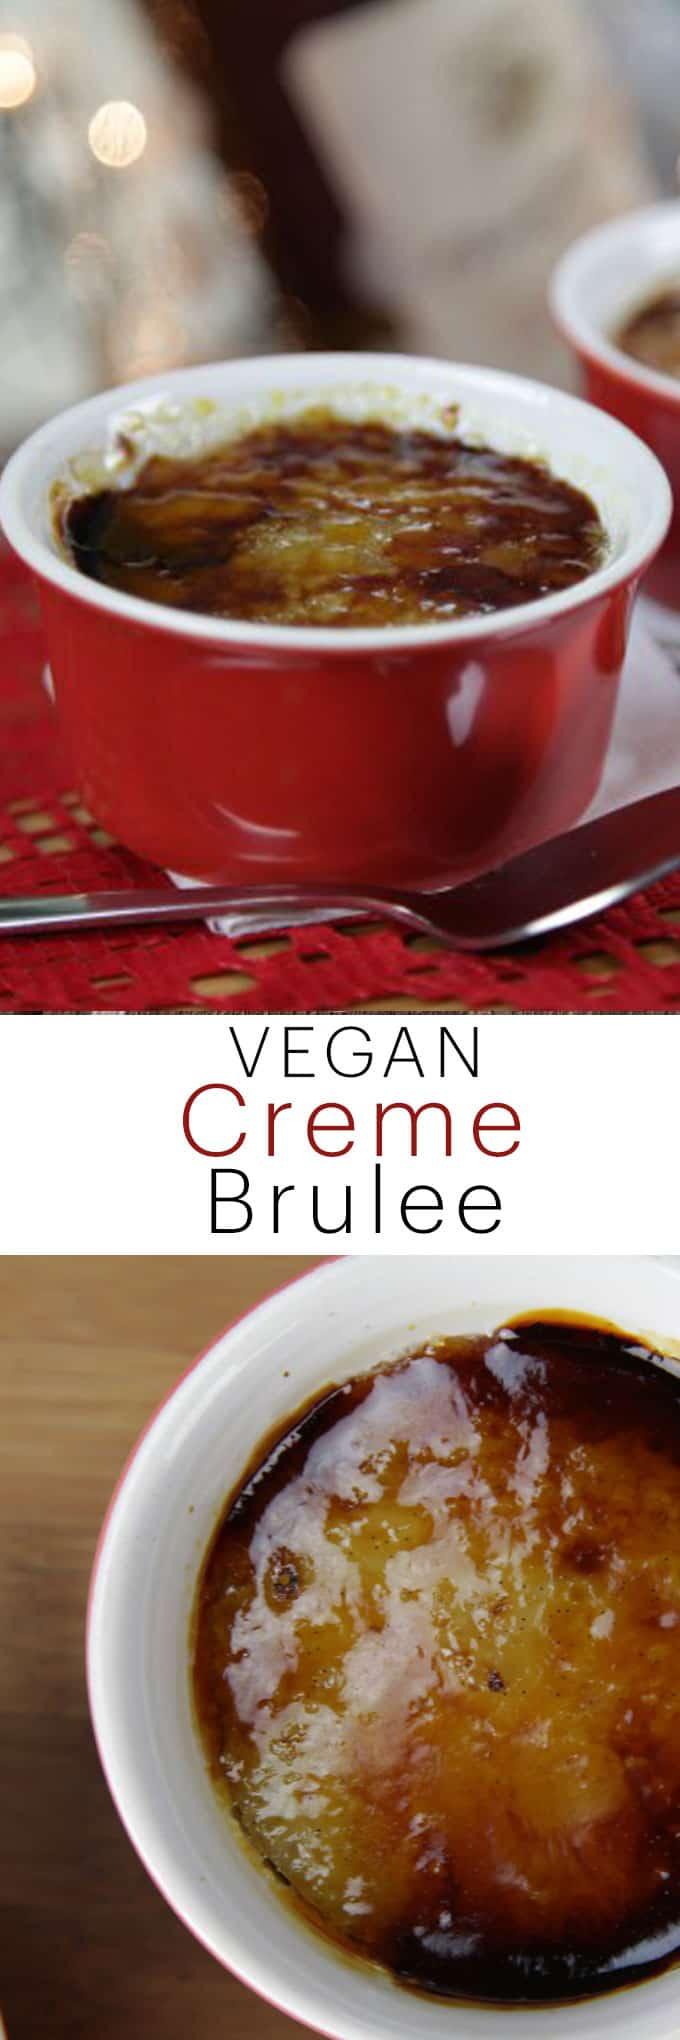 Vegan Creme Brulee